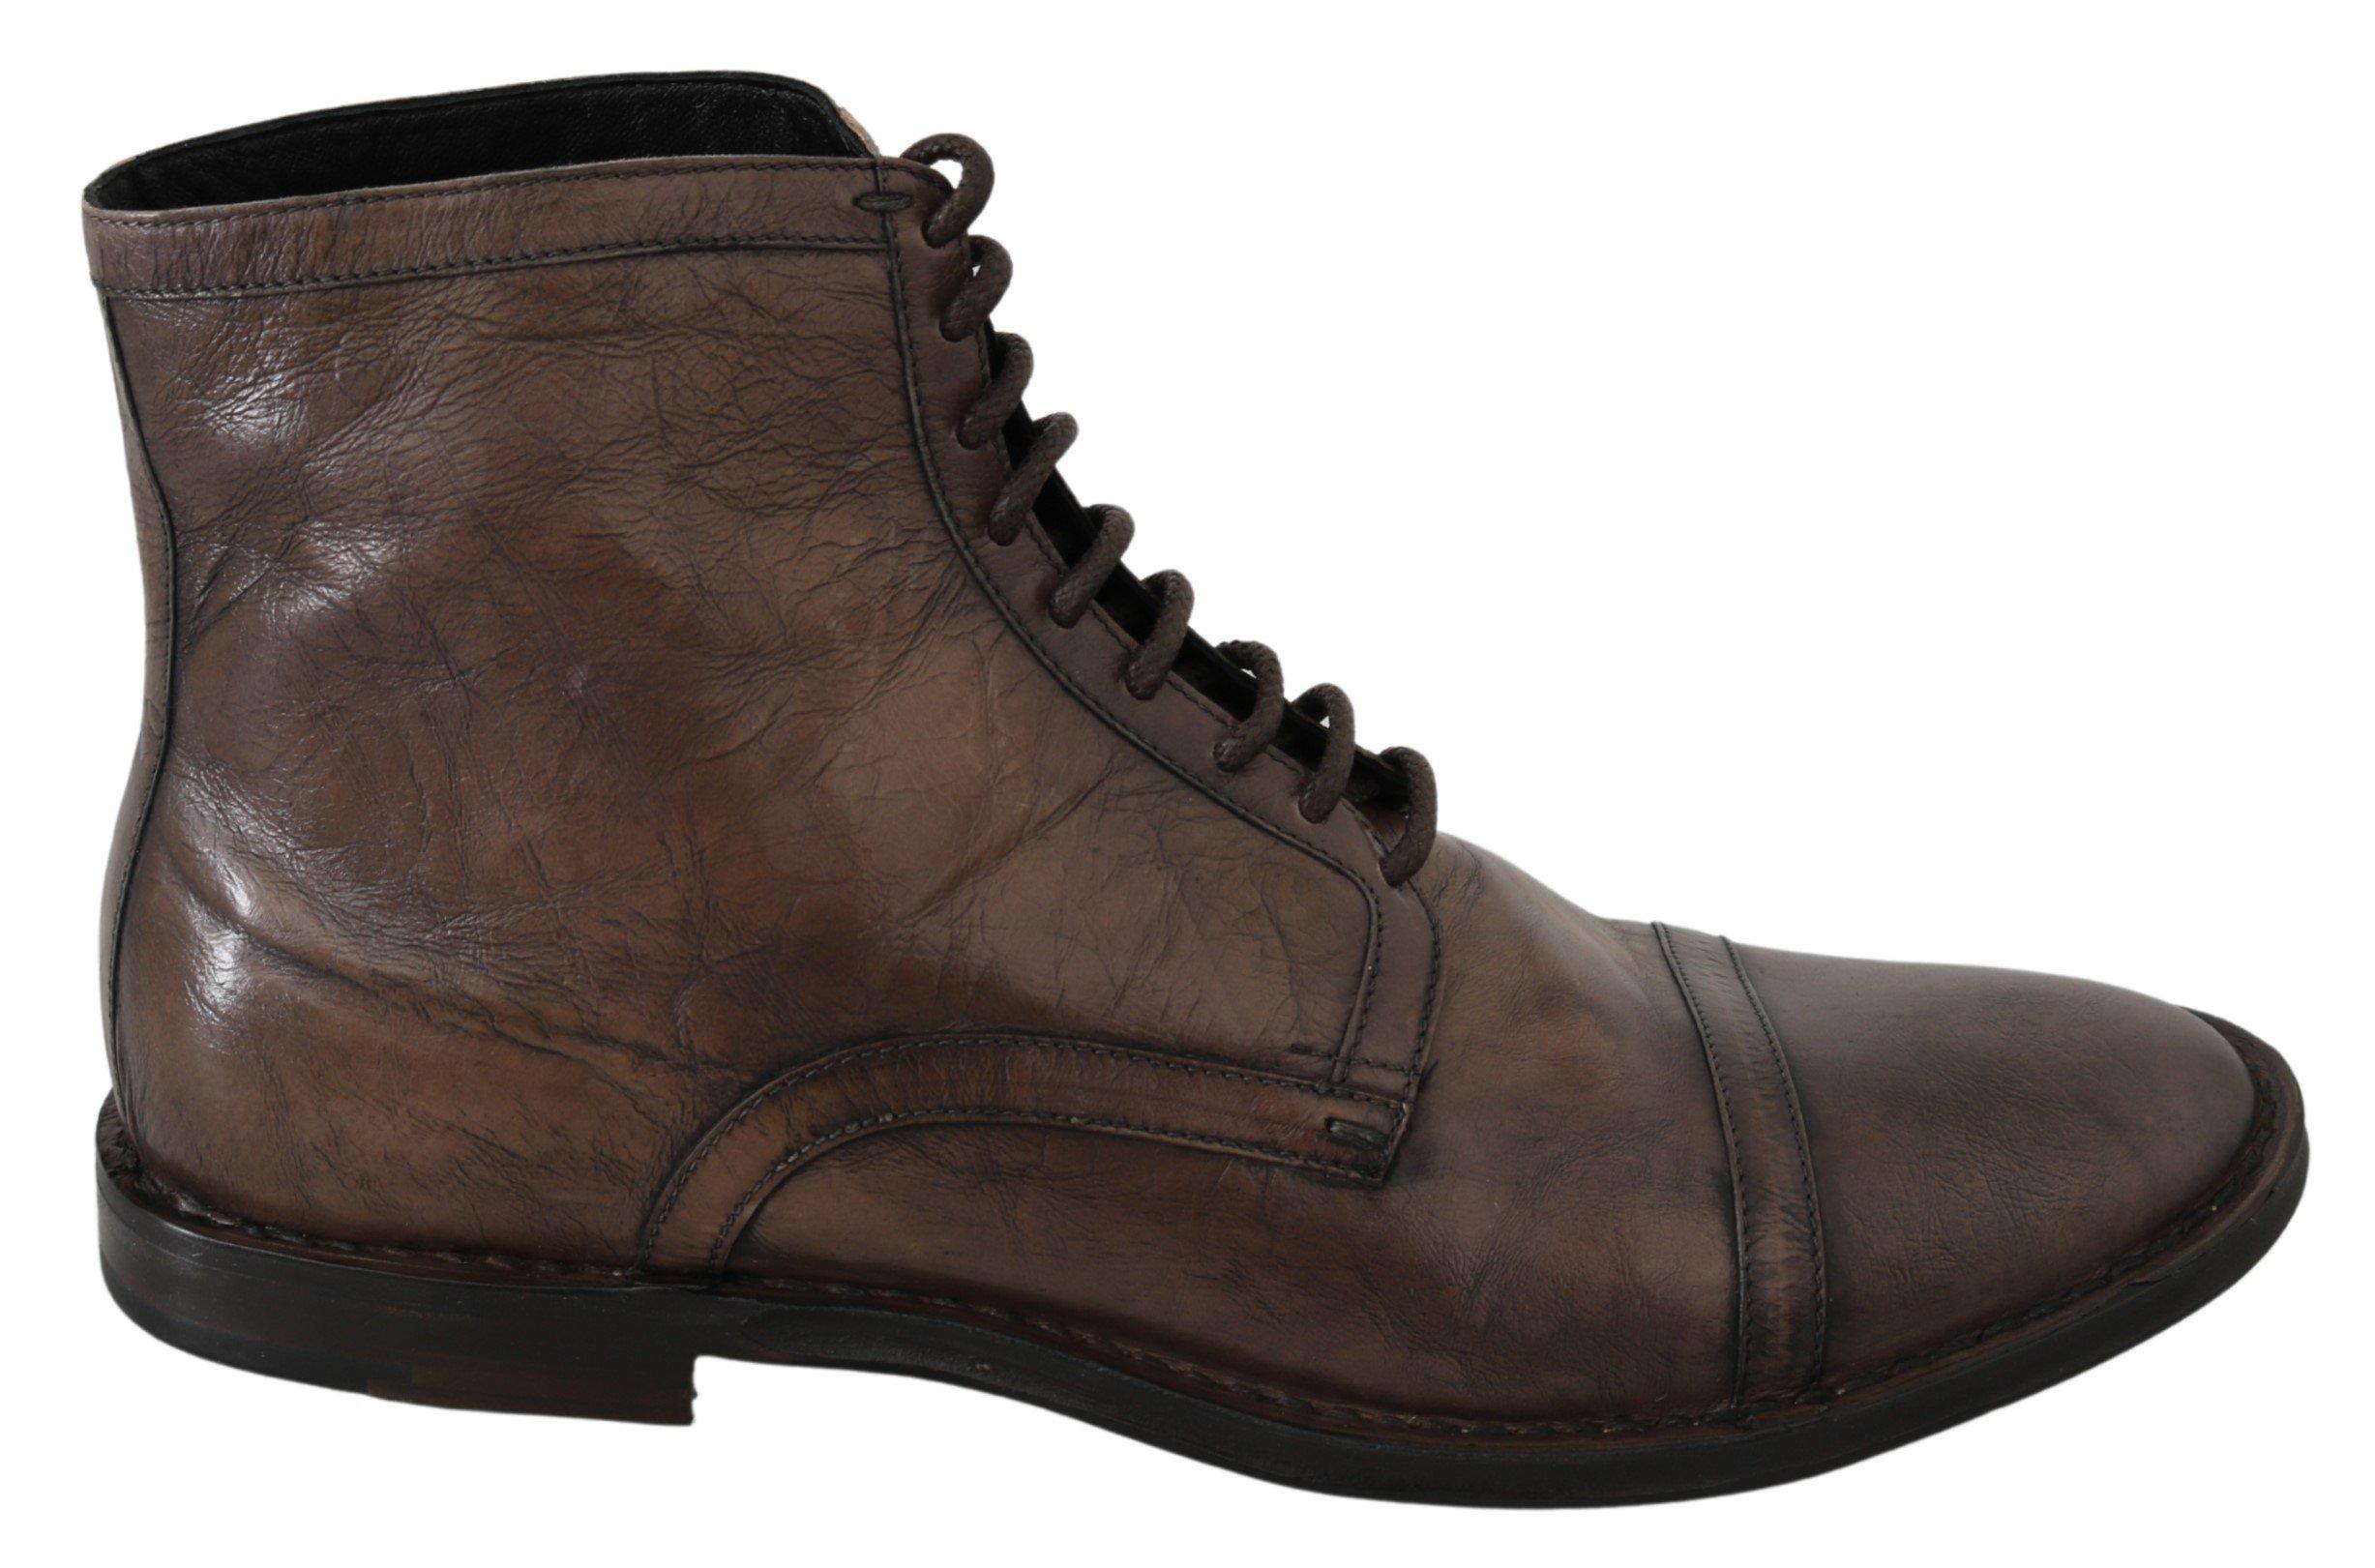 Dolce & Gabbana Men's Patterned Leather Derby Boots Brown MV3059 - EU44/US11